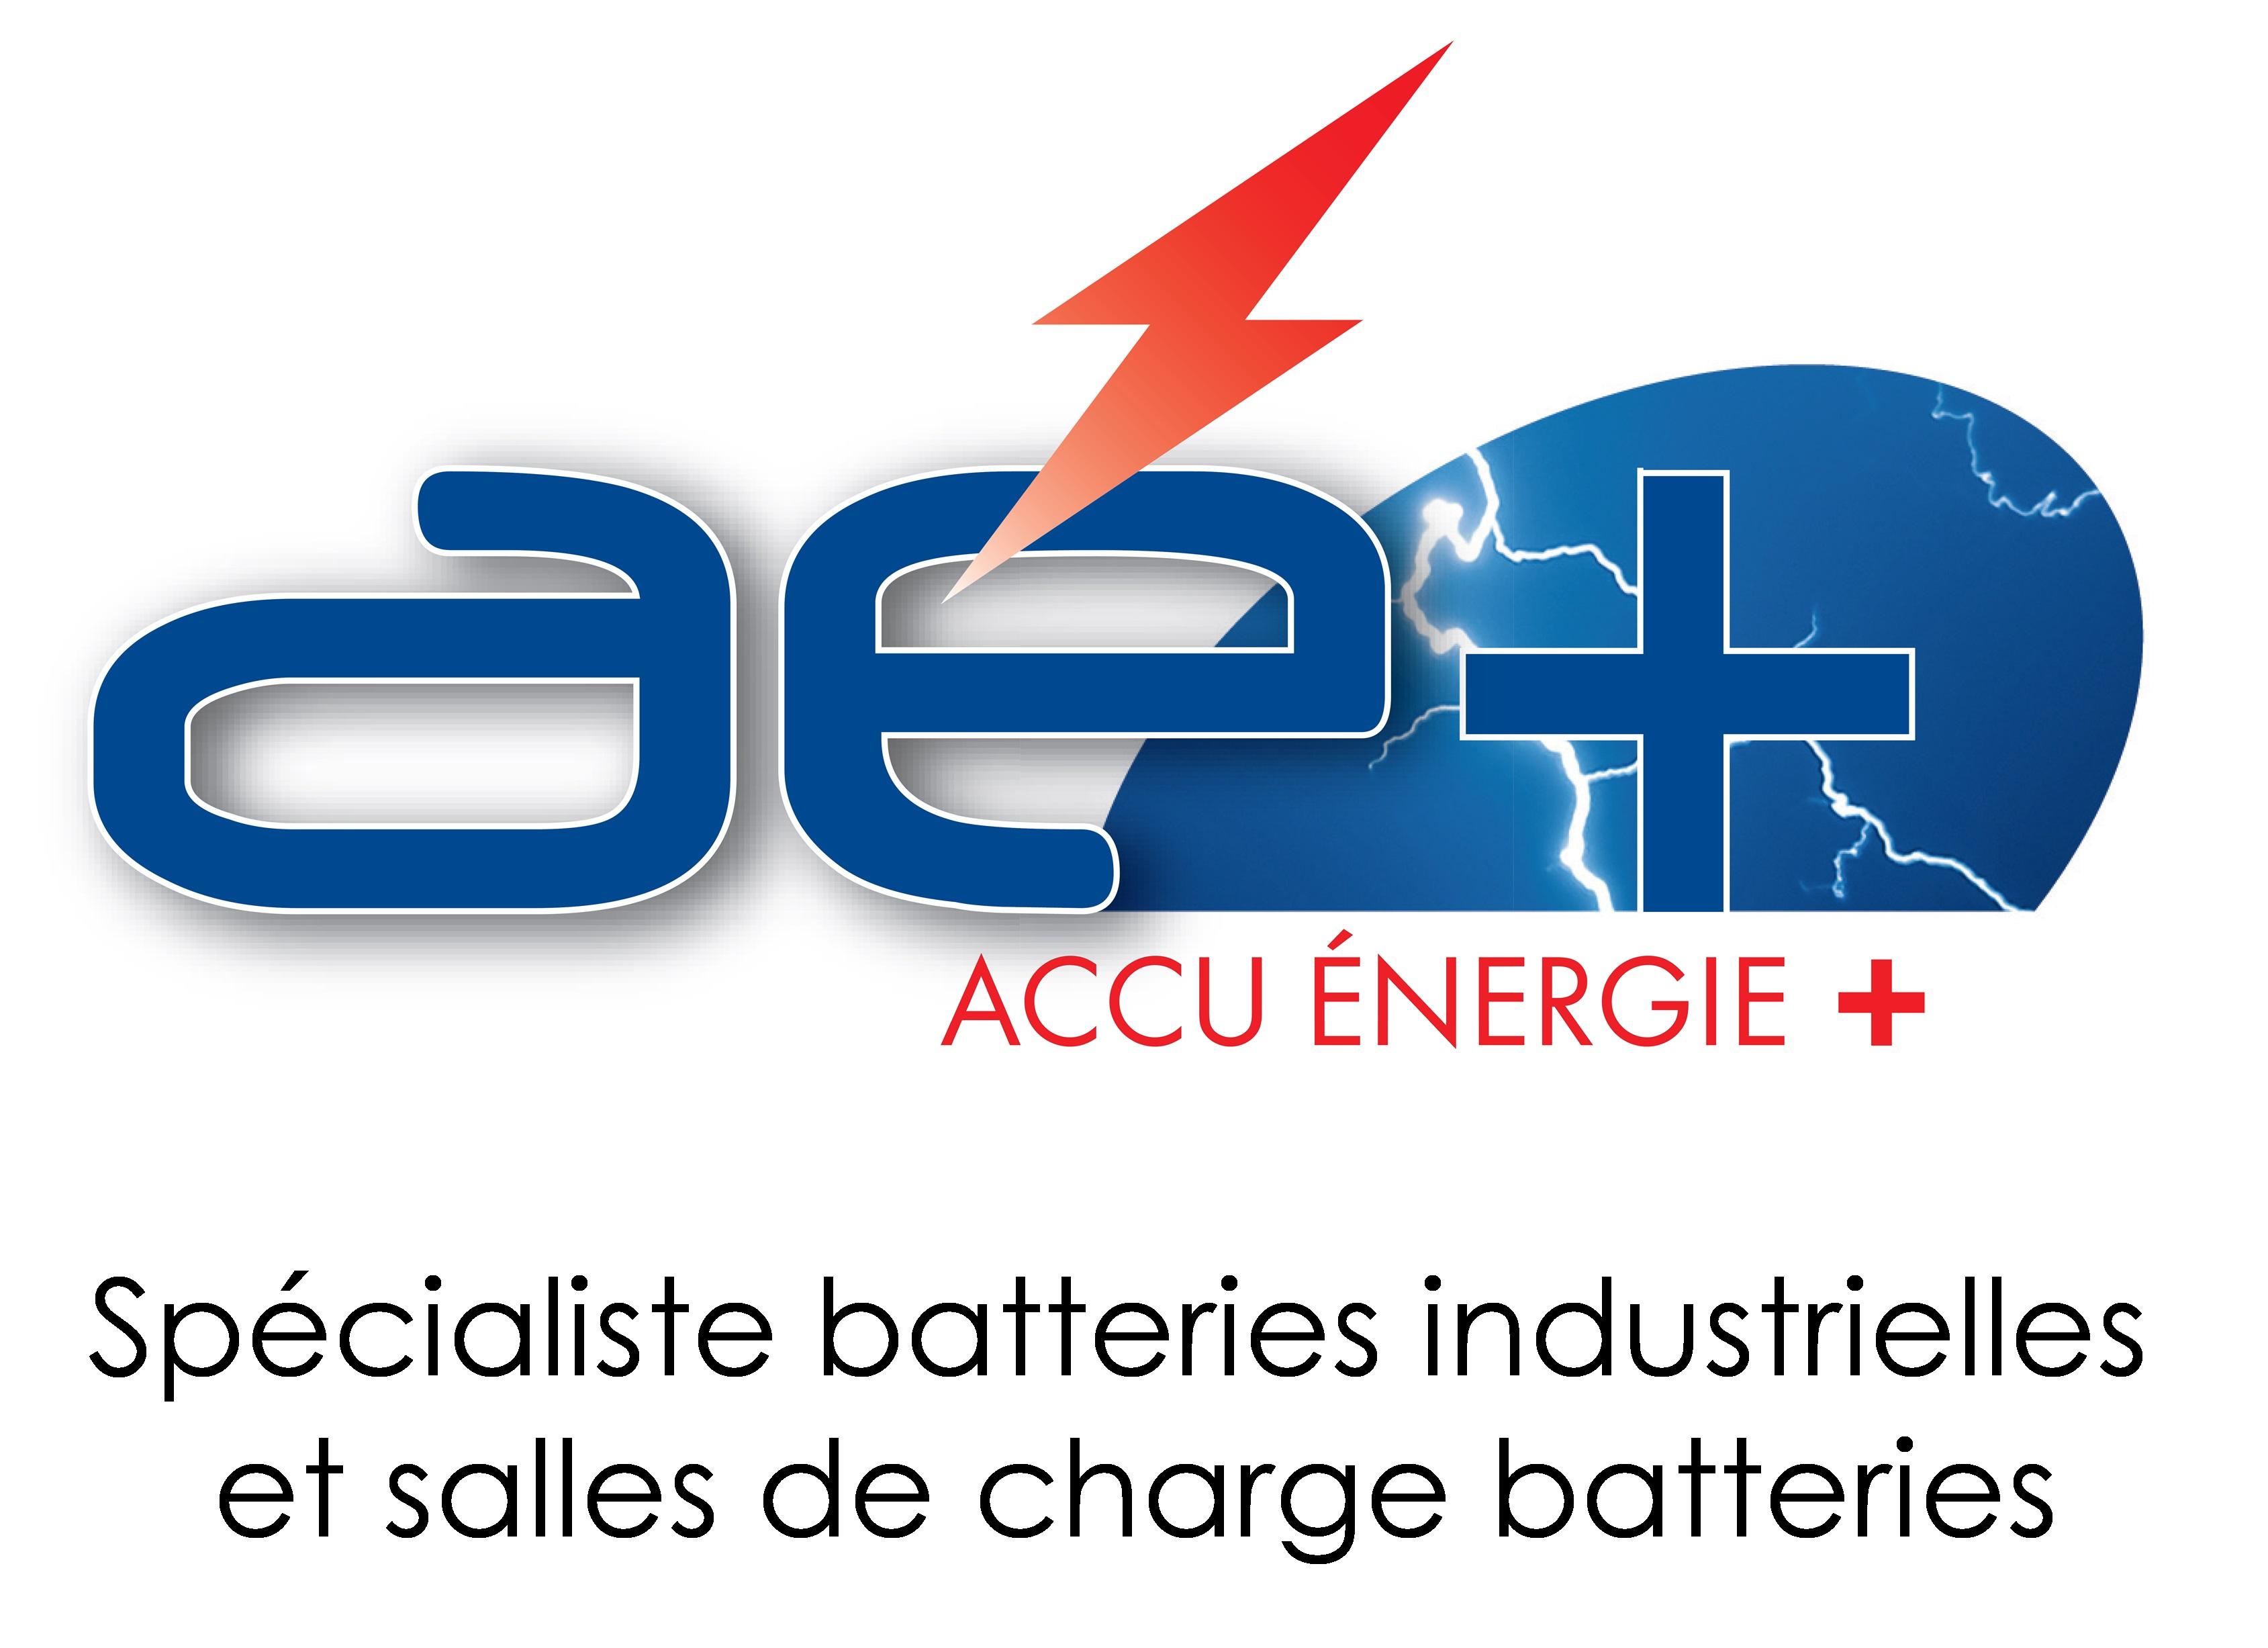 ACCU ENERGIE +